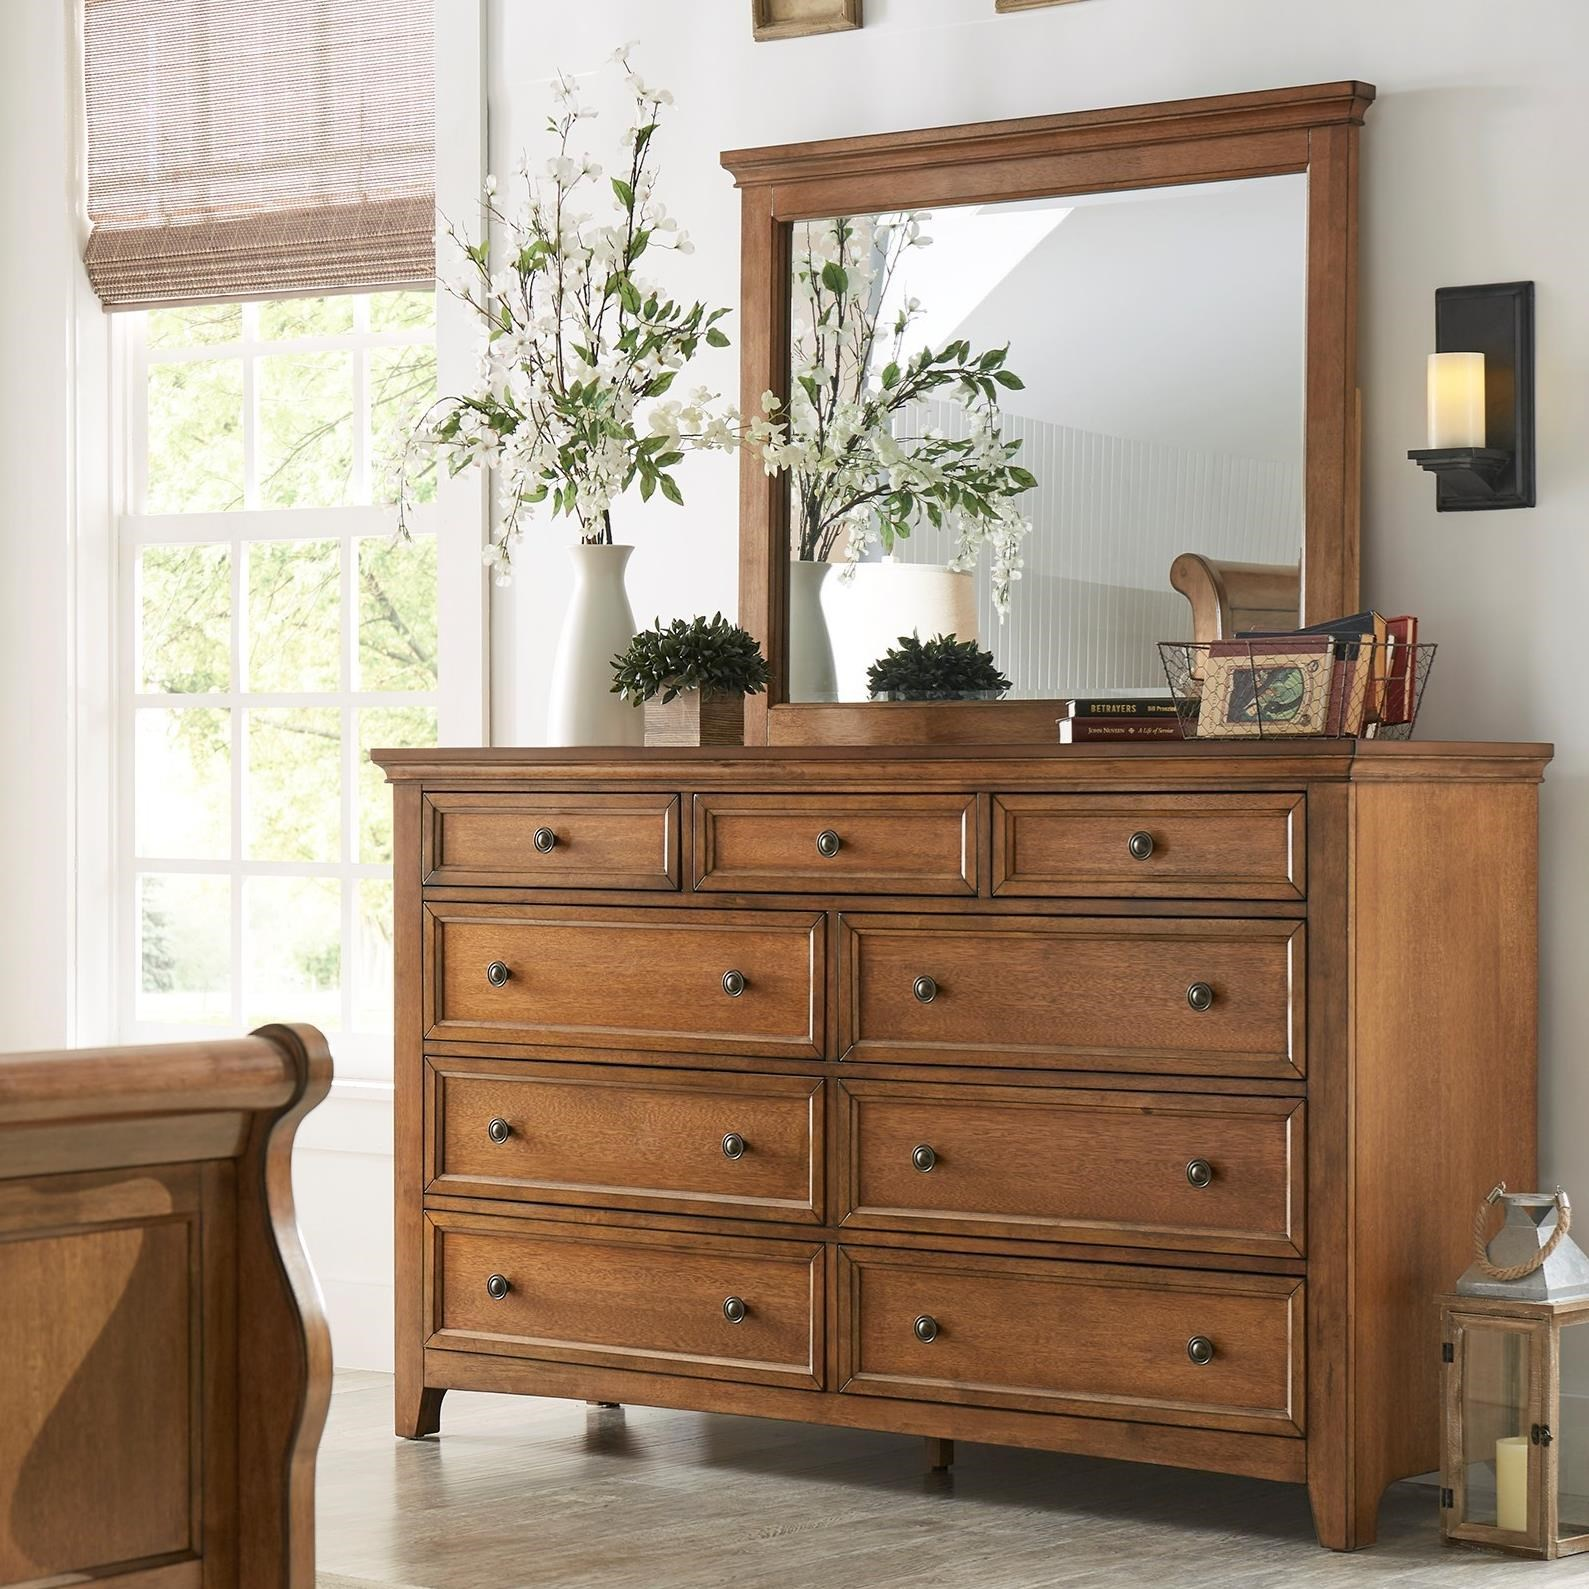 Homelegance 395 Dresser and Mirror Set - Item Number: 395B-5AK+6AK